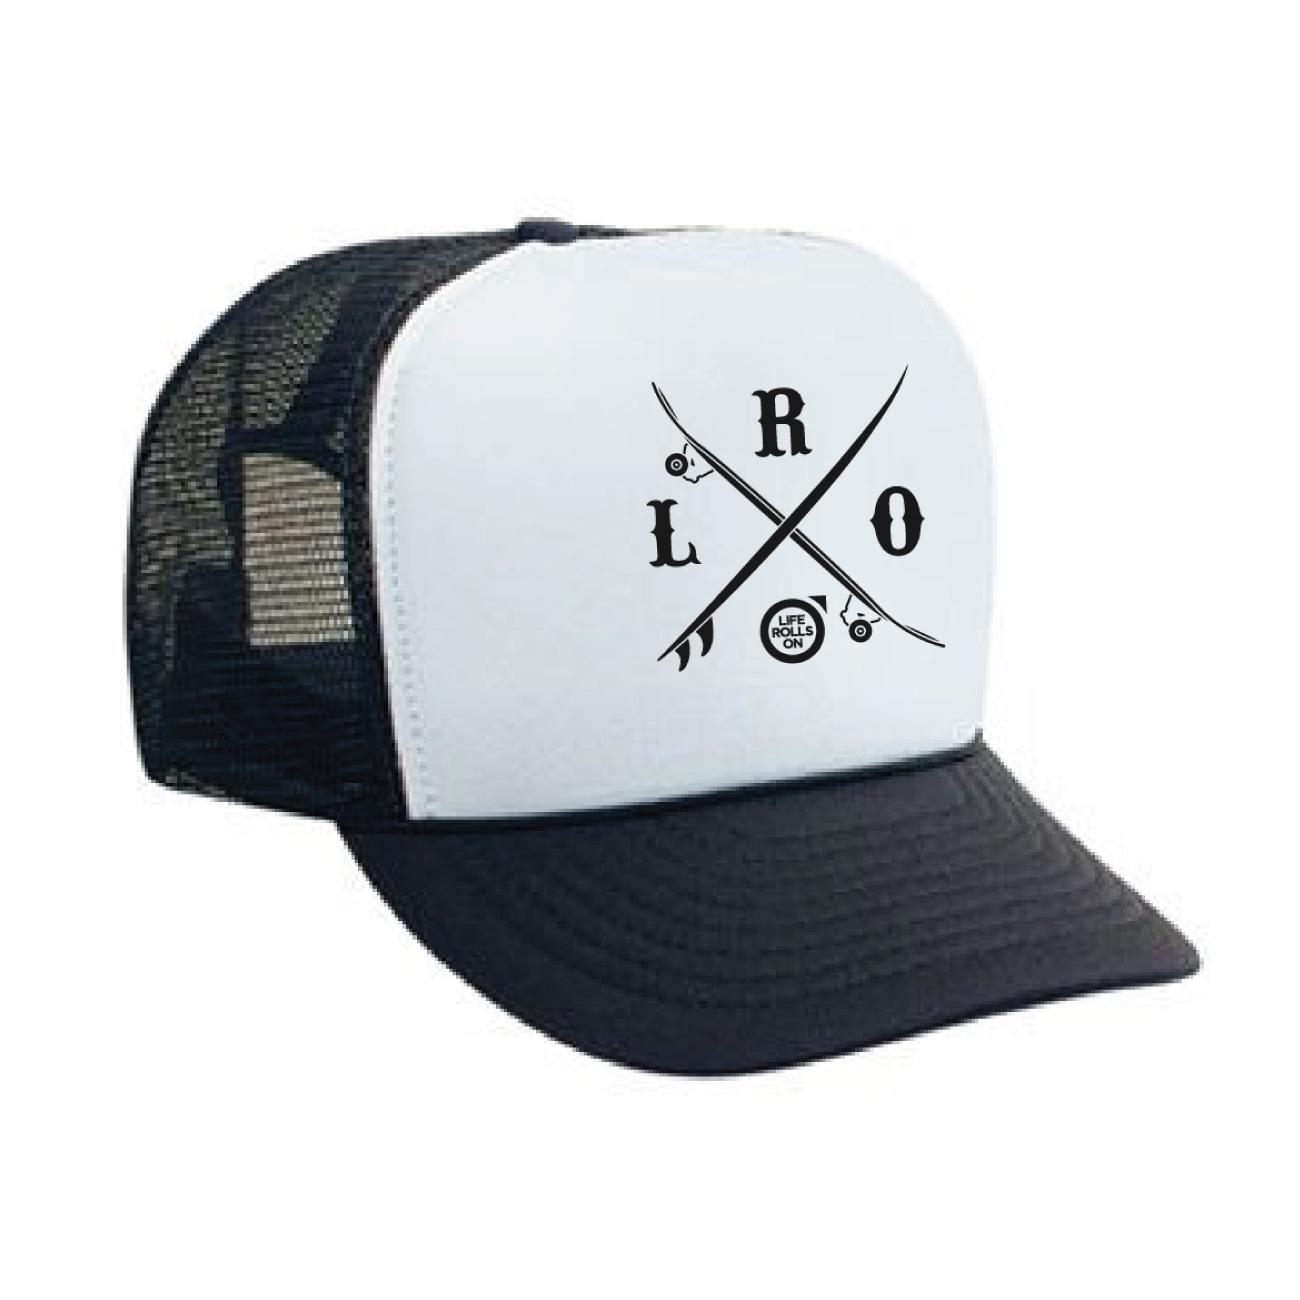 2018 trucker hats-03.jpg